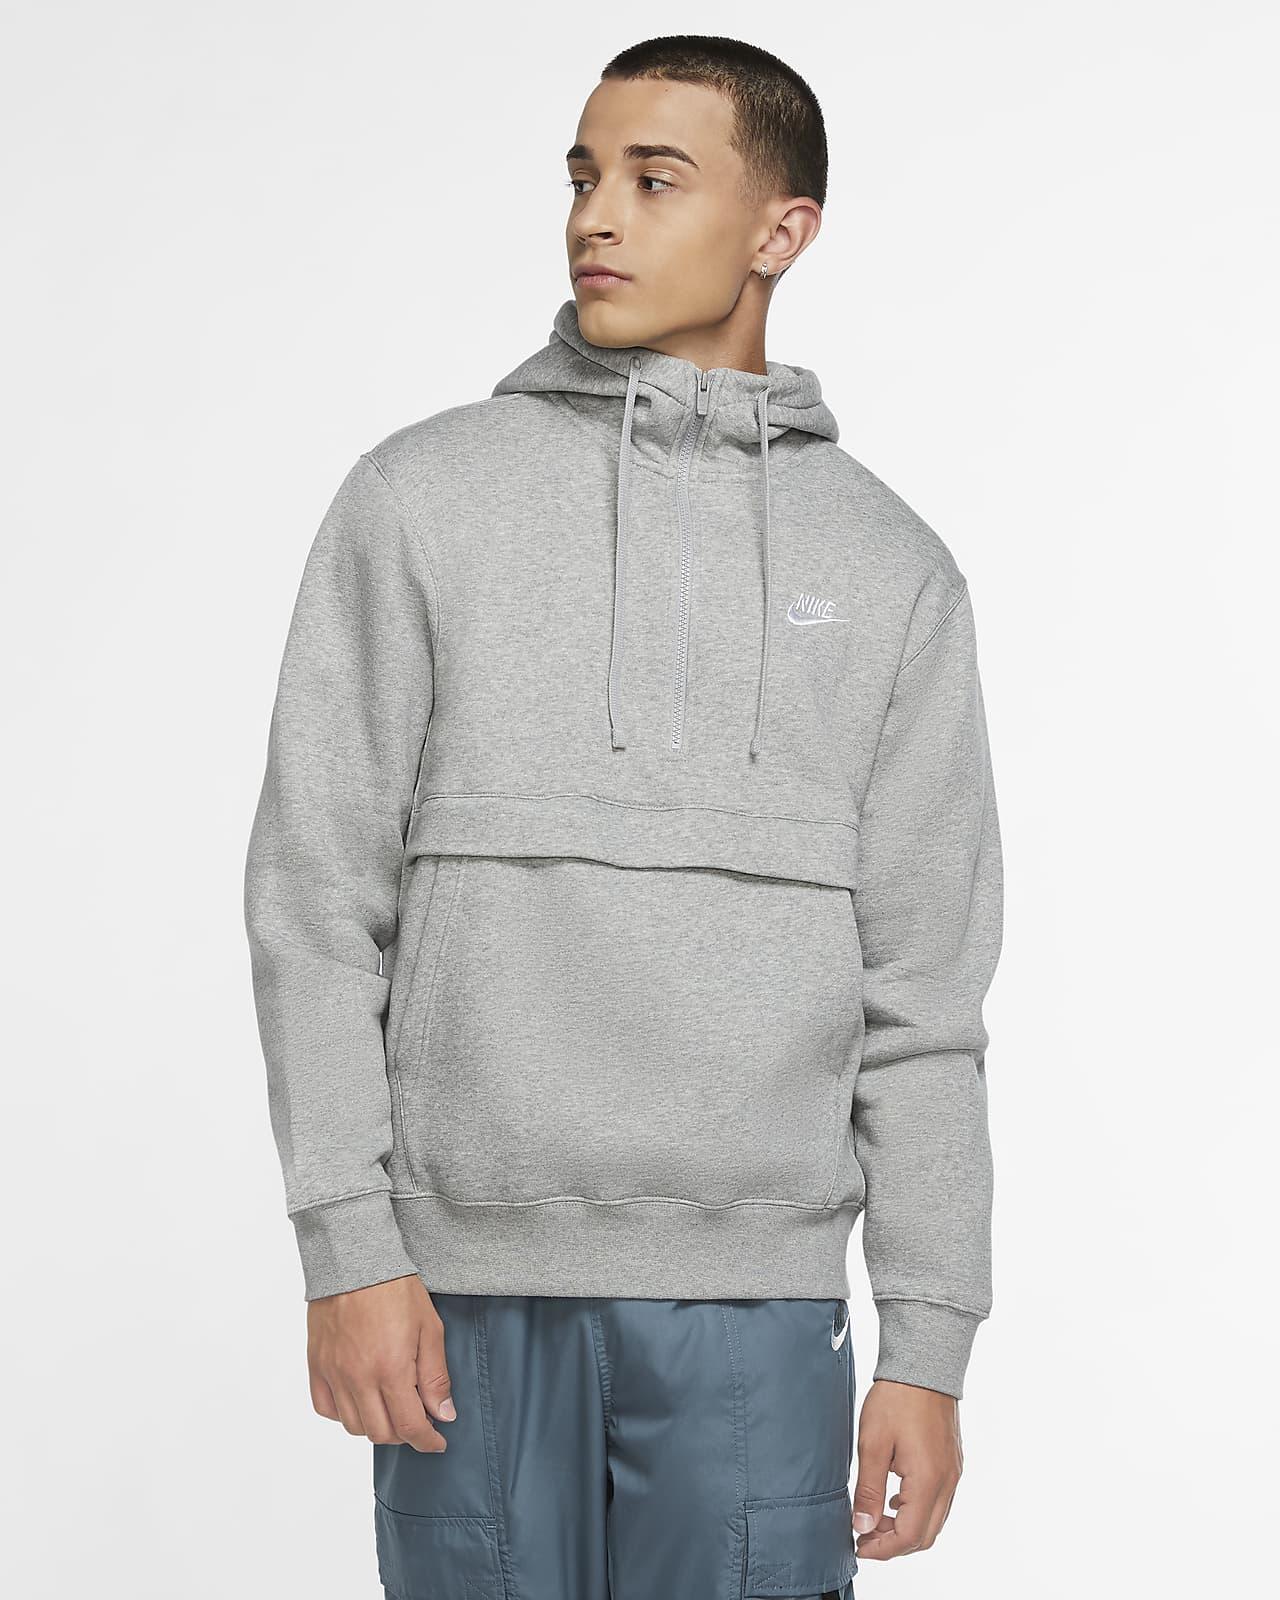 Nike Sportswear Club Fleece Hoodie met halflange rits voor heren